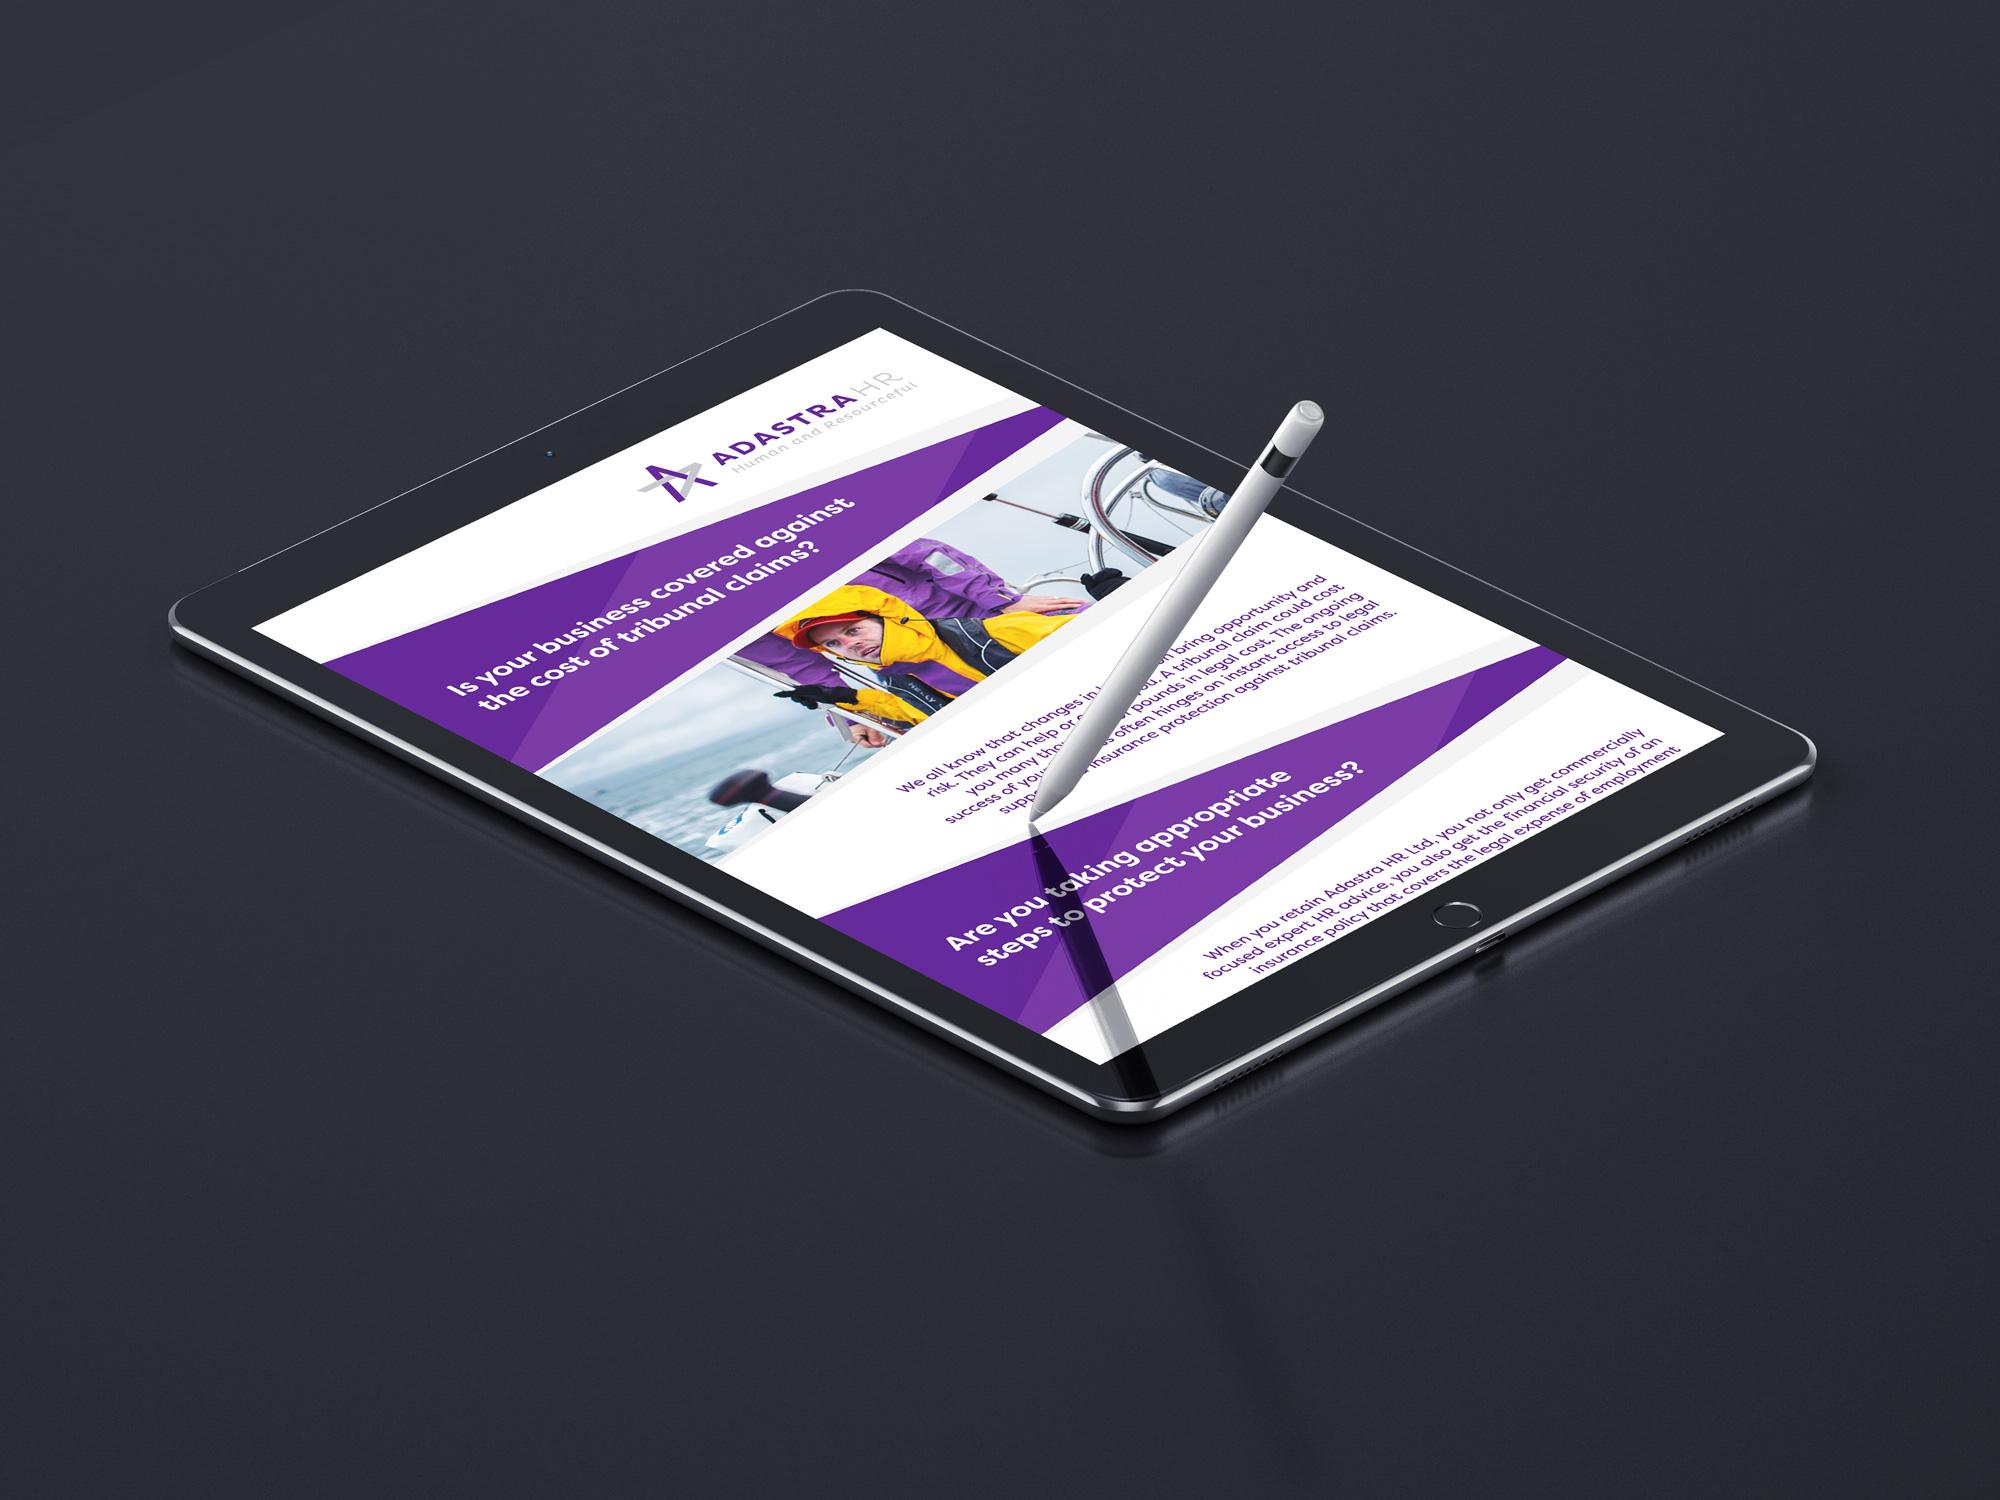 adastra hr | full digital service - Adastra Showcase 2 - Adastra HR | full digital service